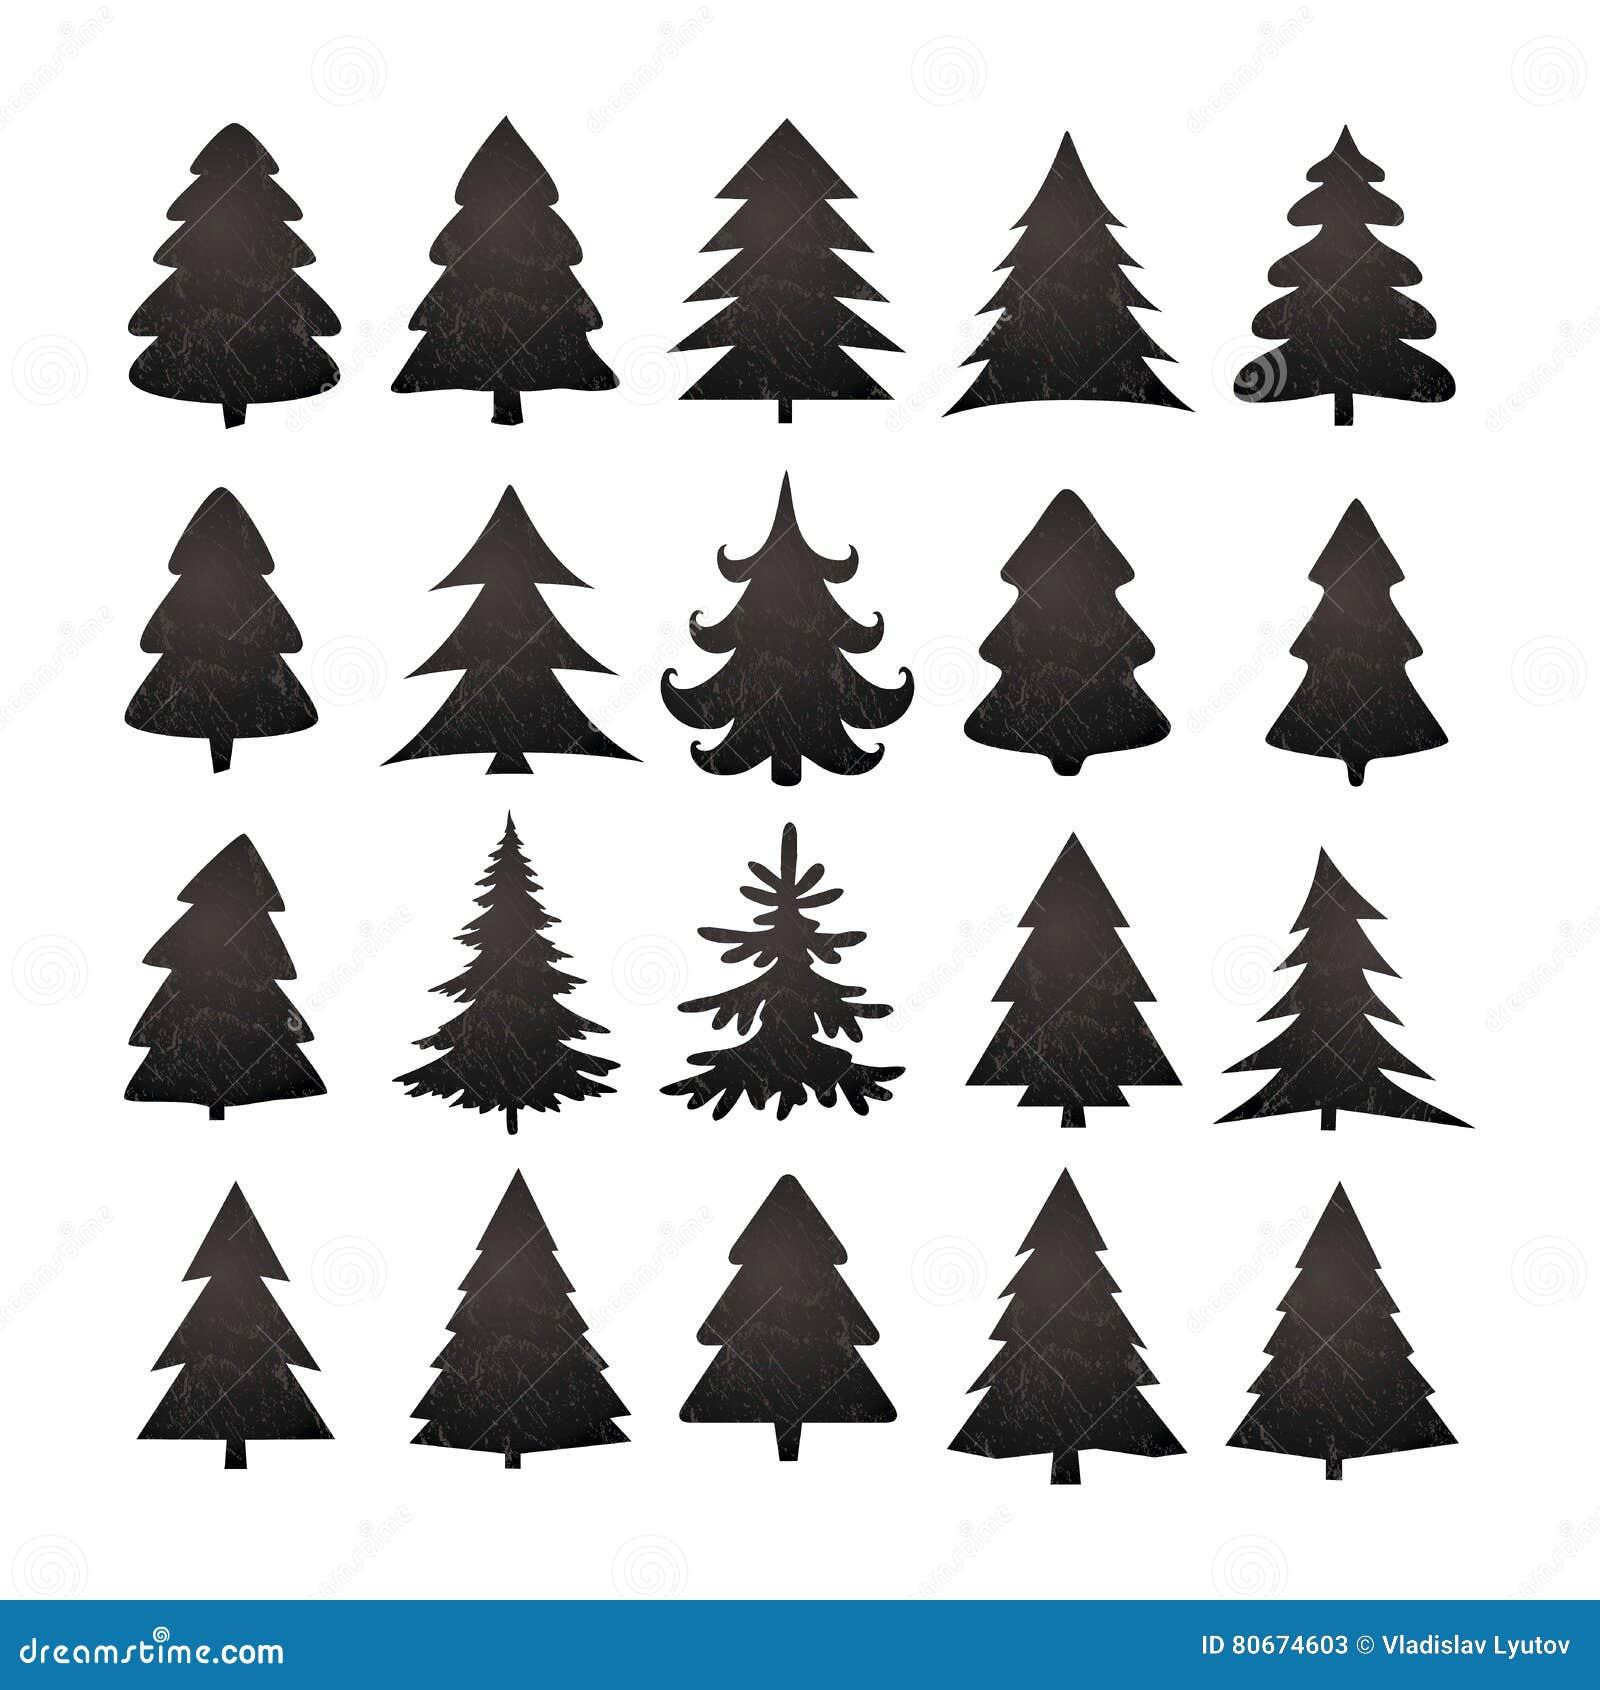 Christmas Tree Clipart Silhouette.Christmas Tree Silhouette Design Vector Set Stock Vector